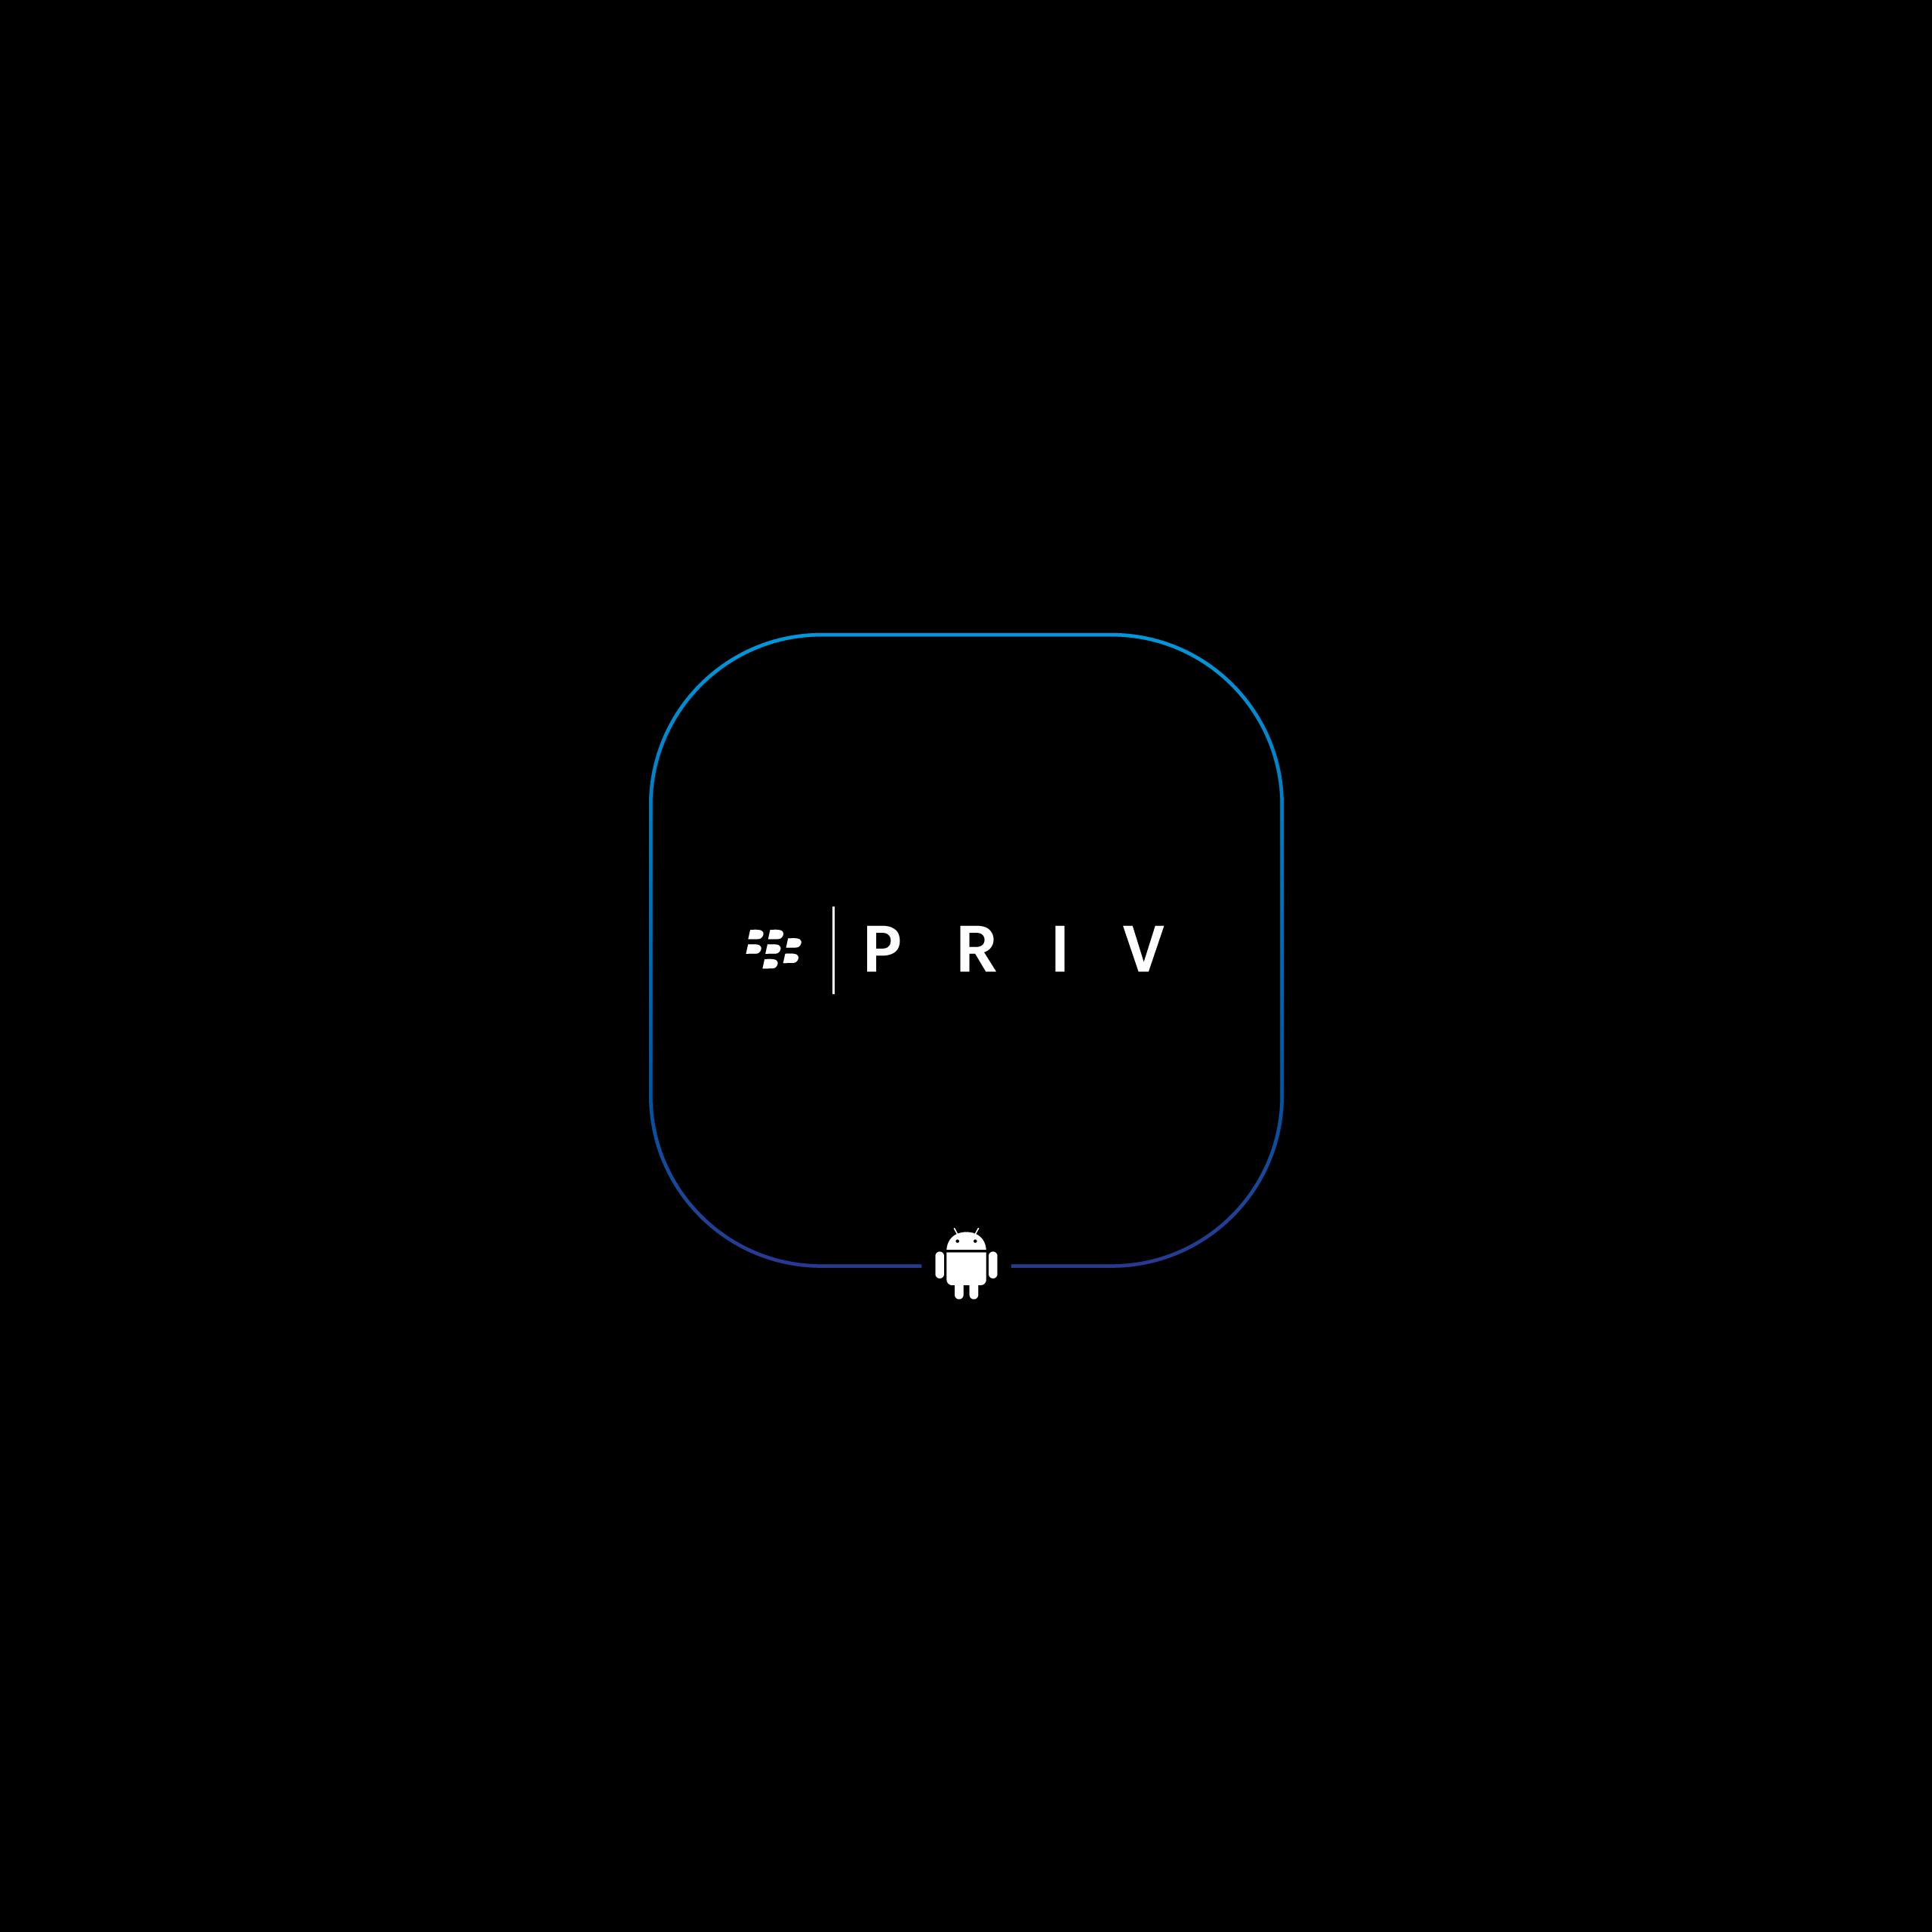 Blackberry Priv Logo PNG - 31036